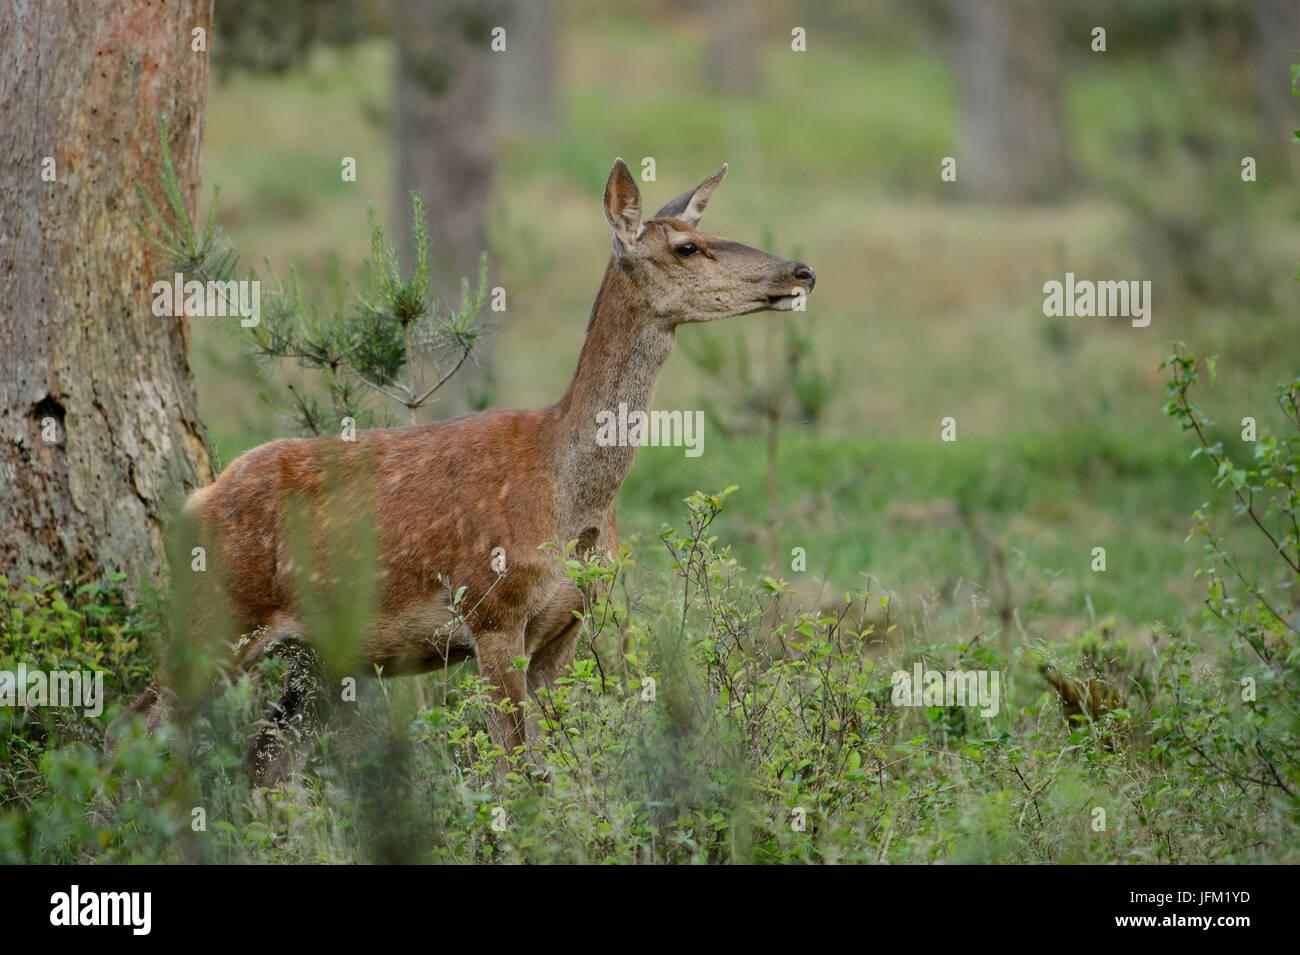 Red Deer hind sentir dans l'air. Le Parc national Hoge Veluwe, Pays-Bas Photo Stock